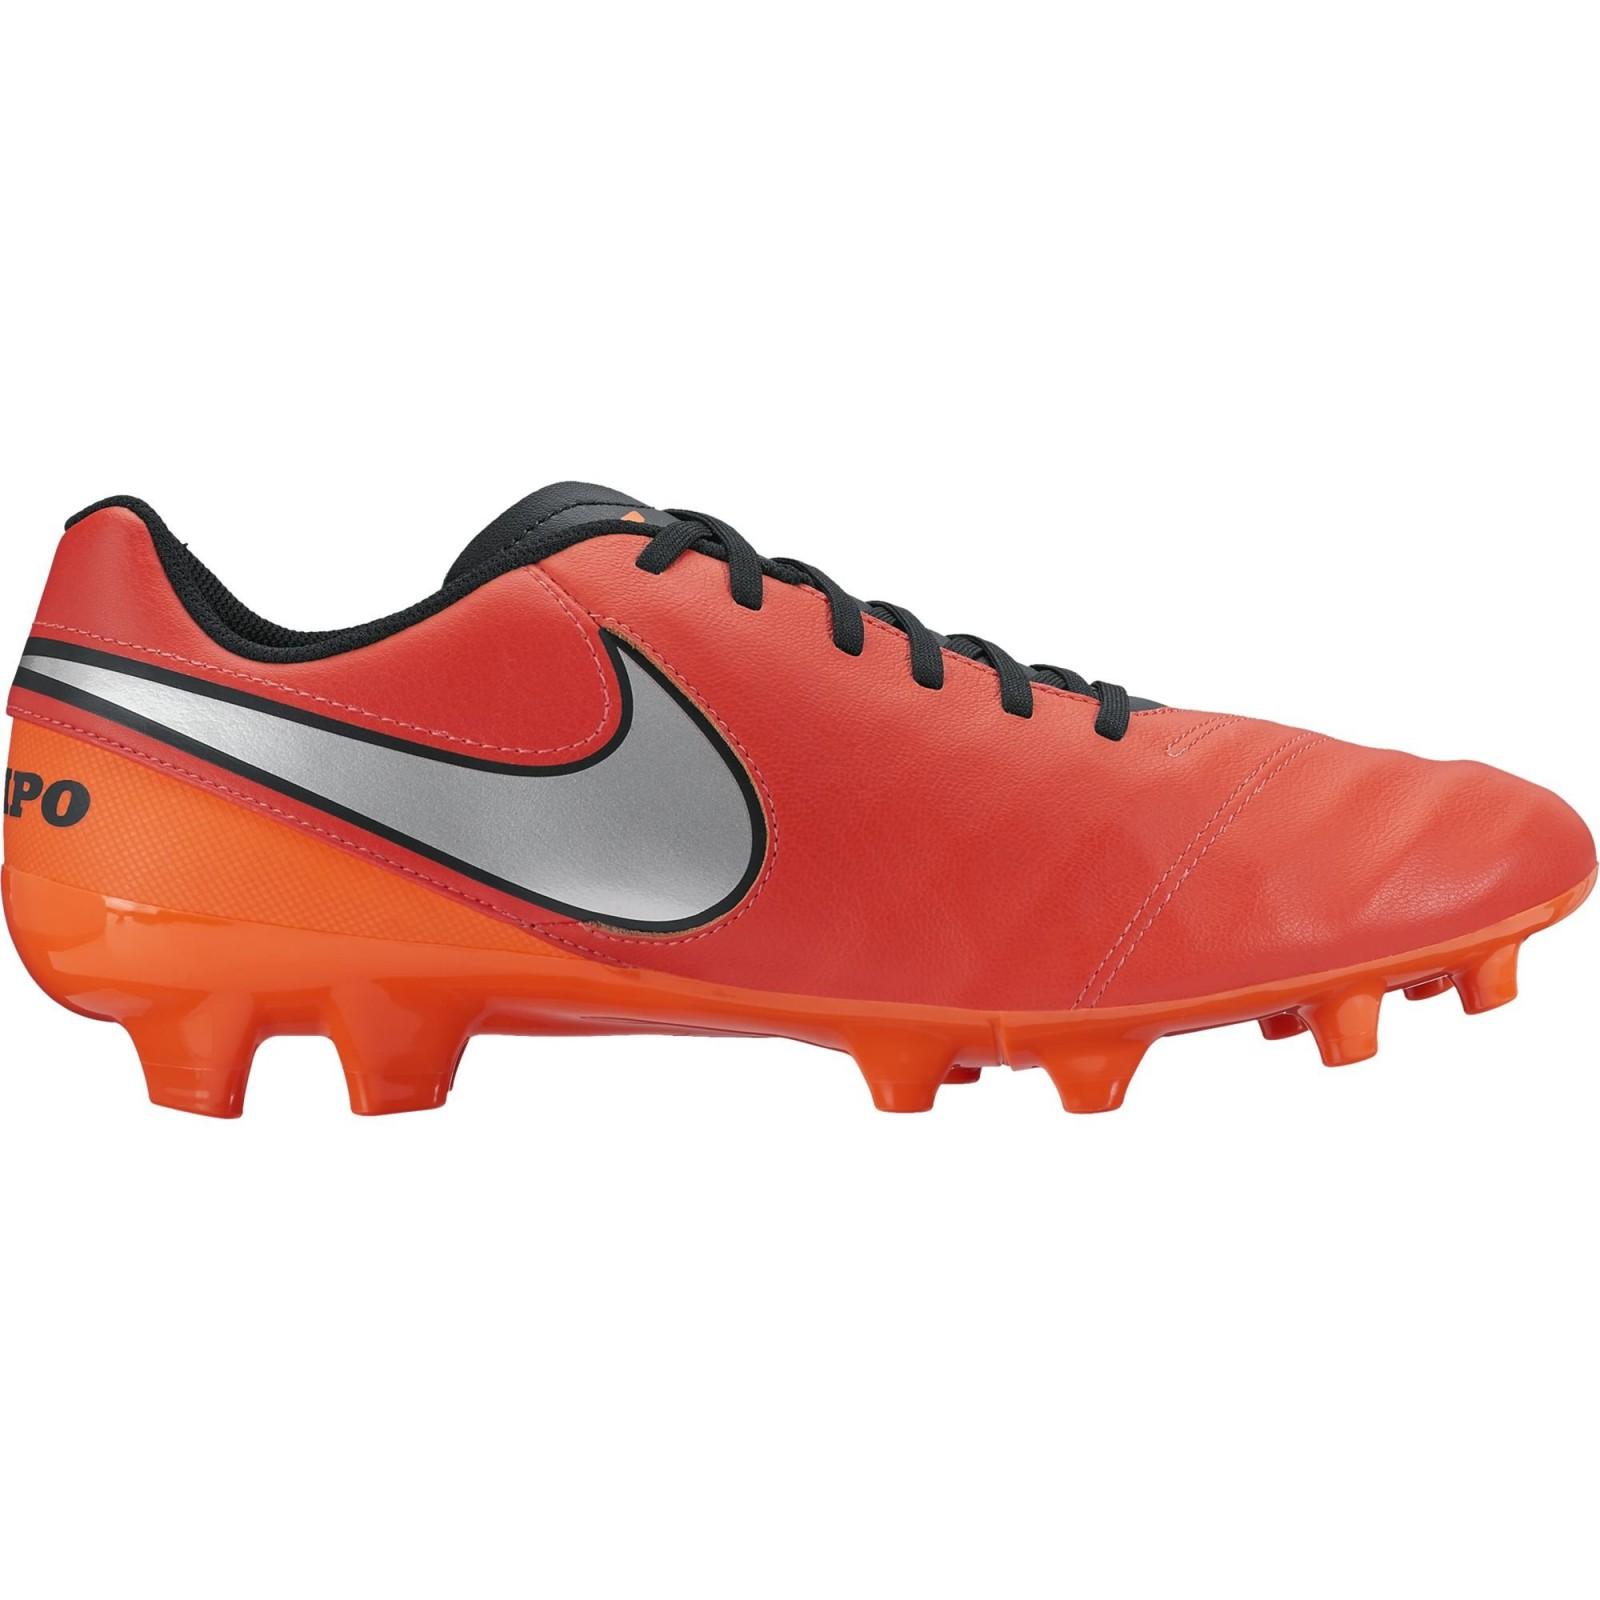 7d0c42361 Pánské kopačky Nike TIEMPO GENIO II LEATHER FG LT CRMSN/MTLLC SLVR-TTL  CRMSN. 1